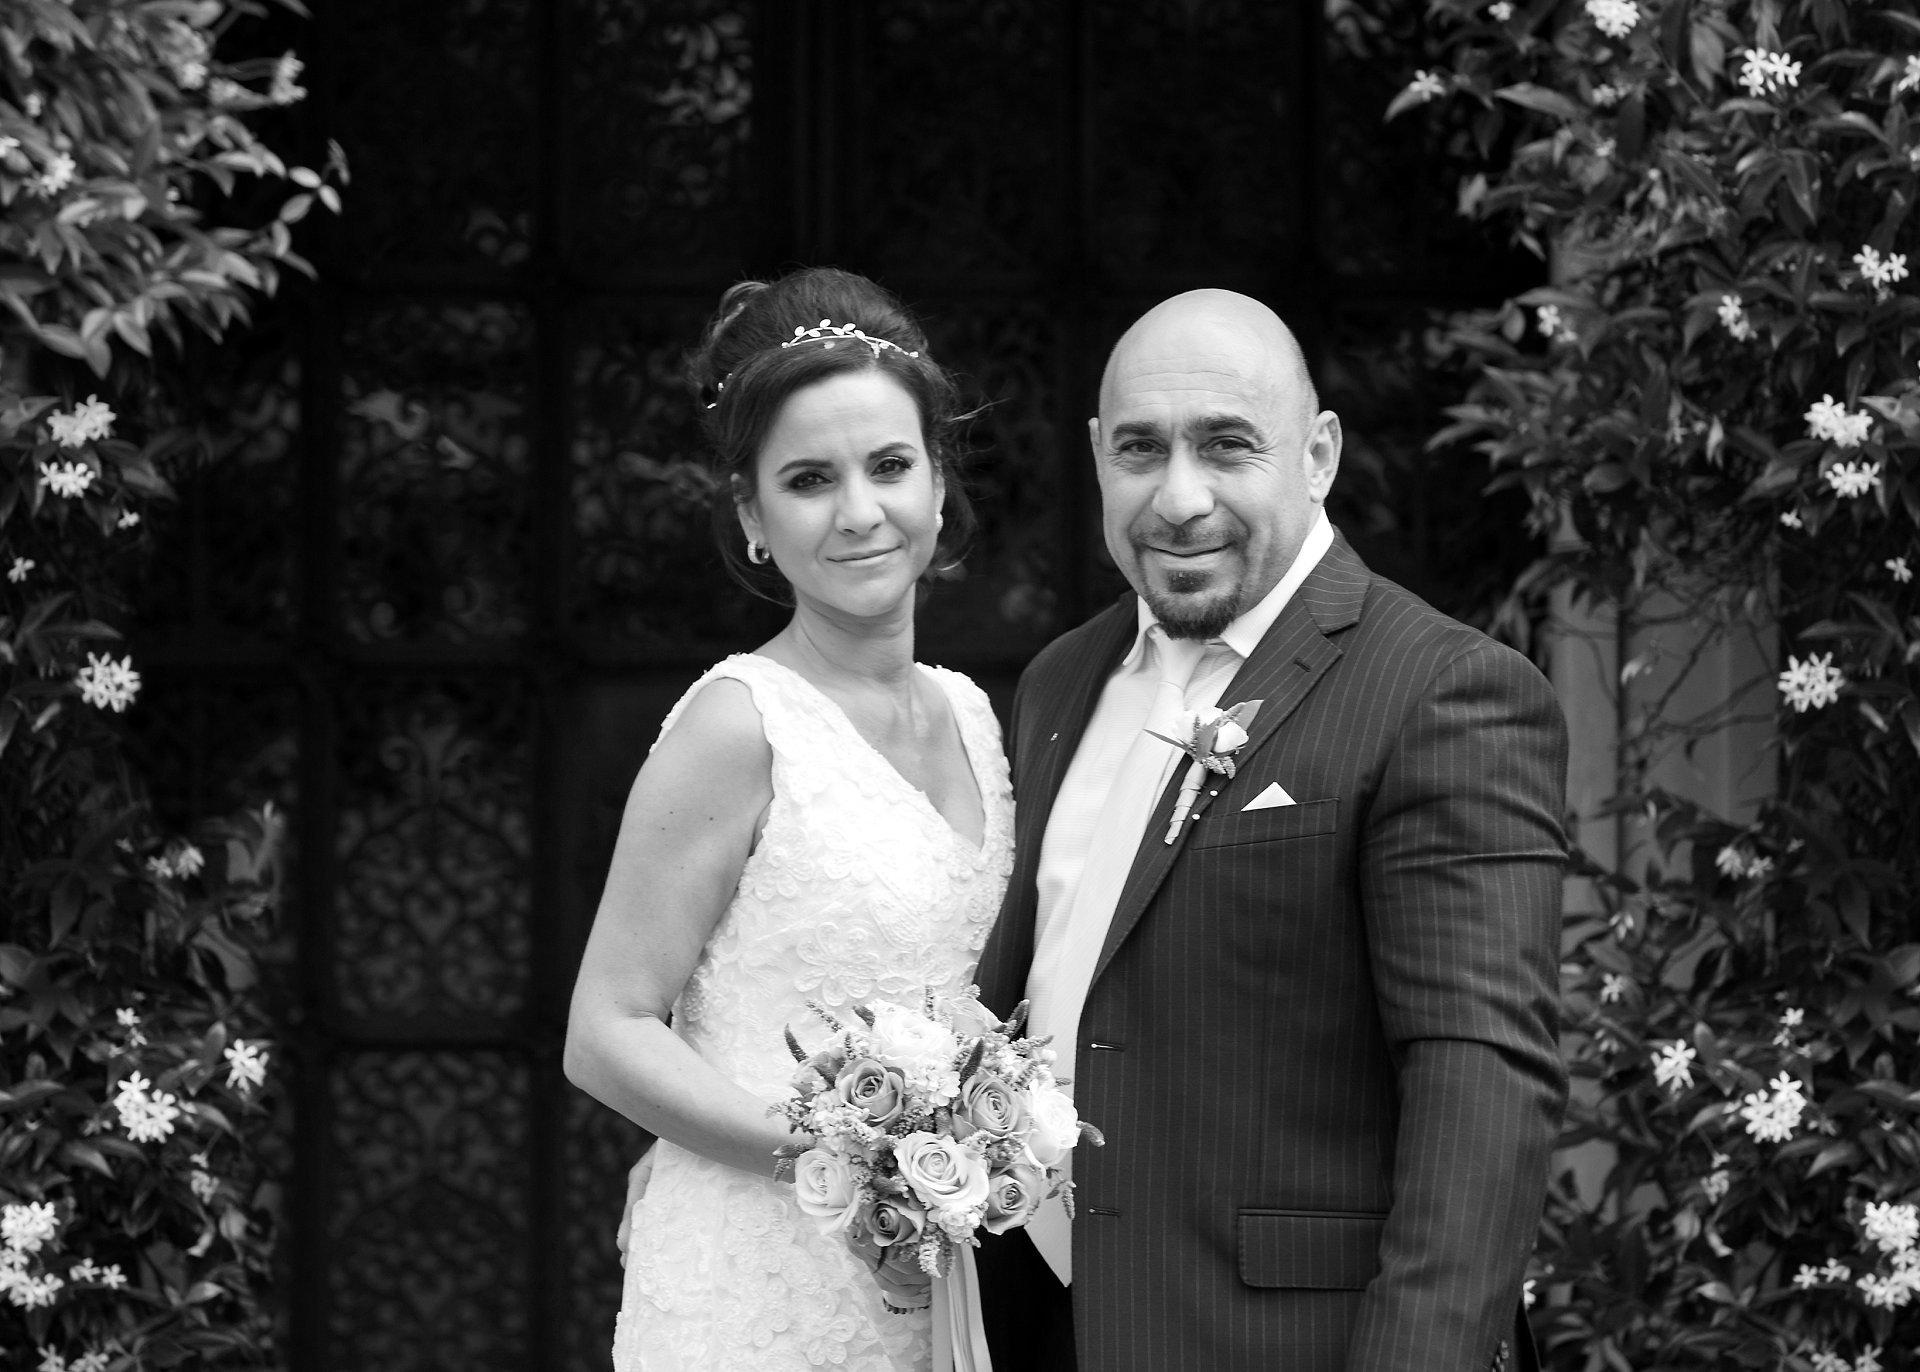 Bride & groom after their wedding in London's Chelsea